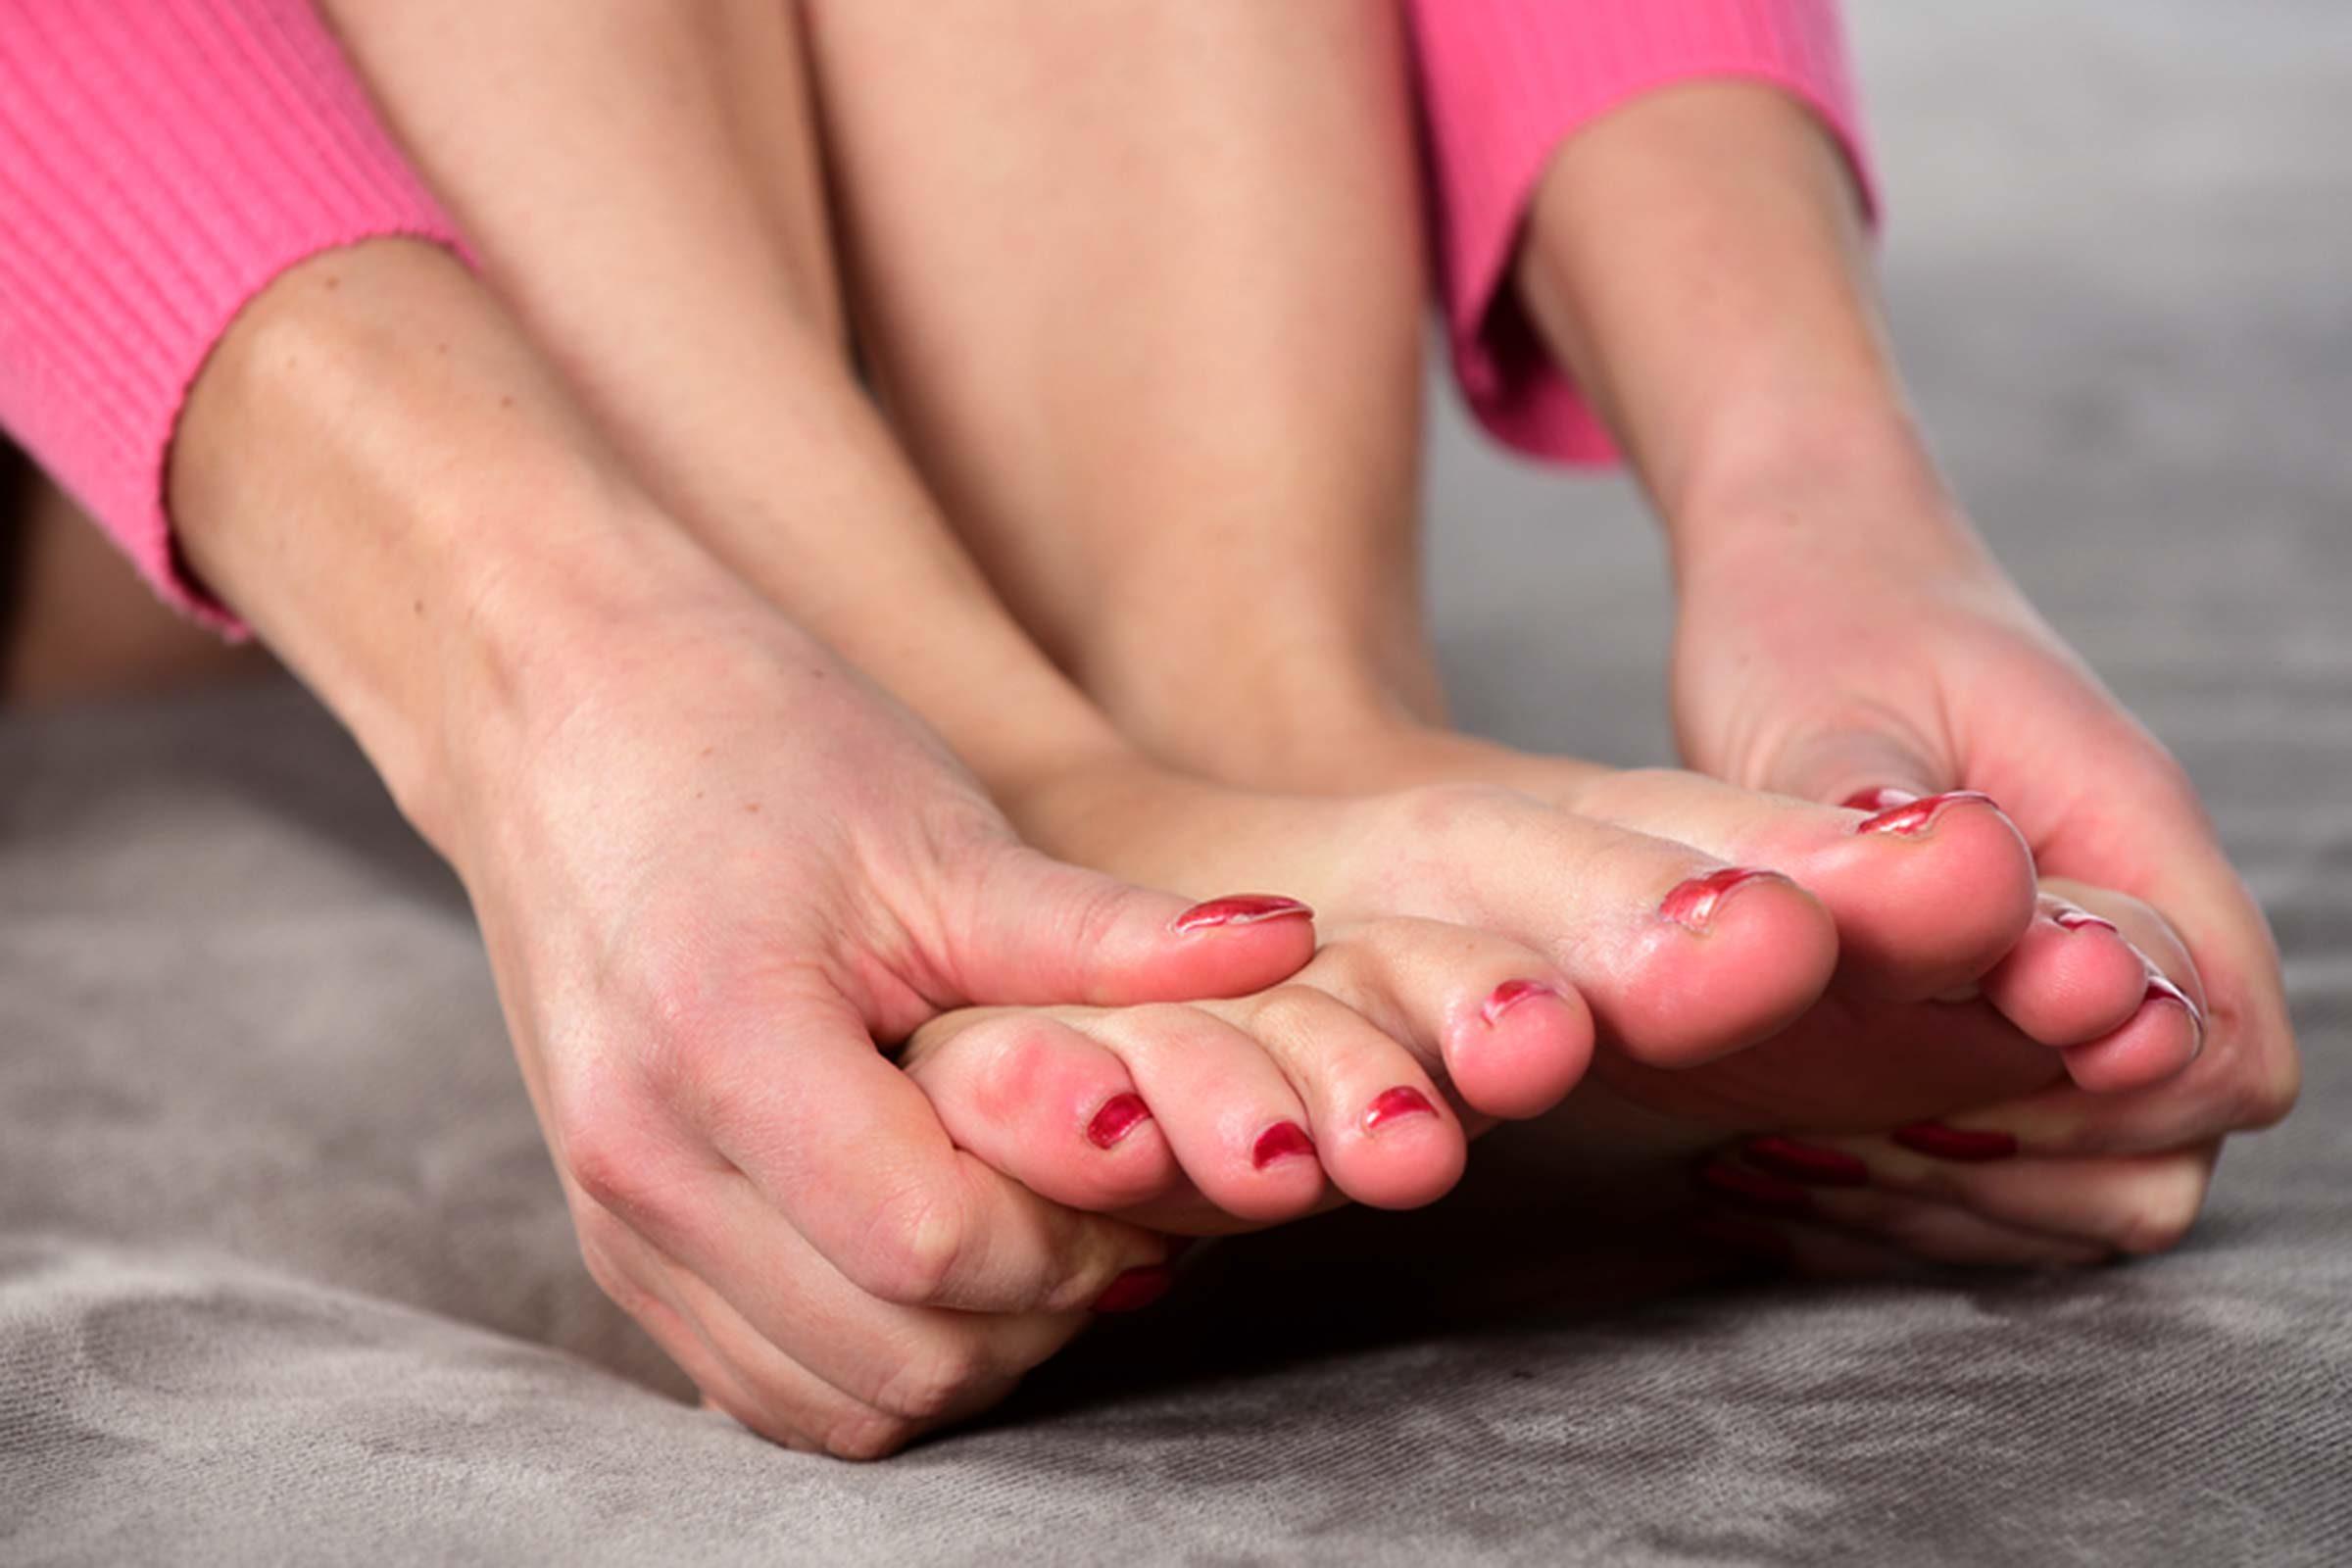 woman rubbing feet